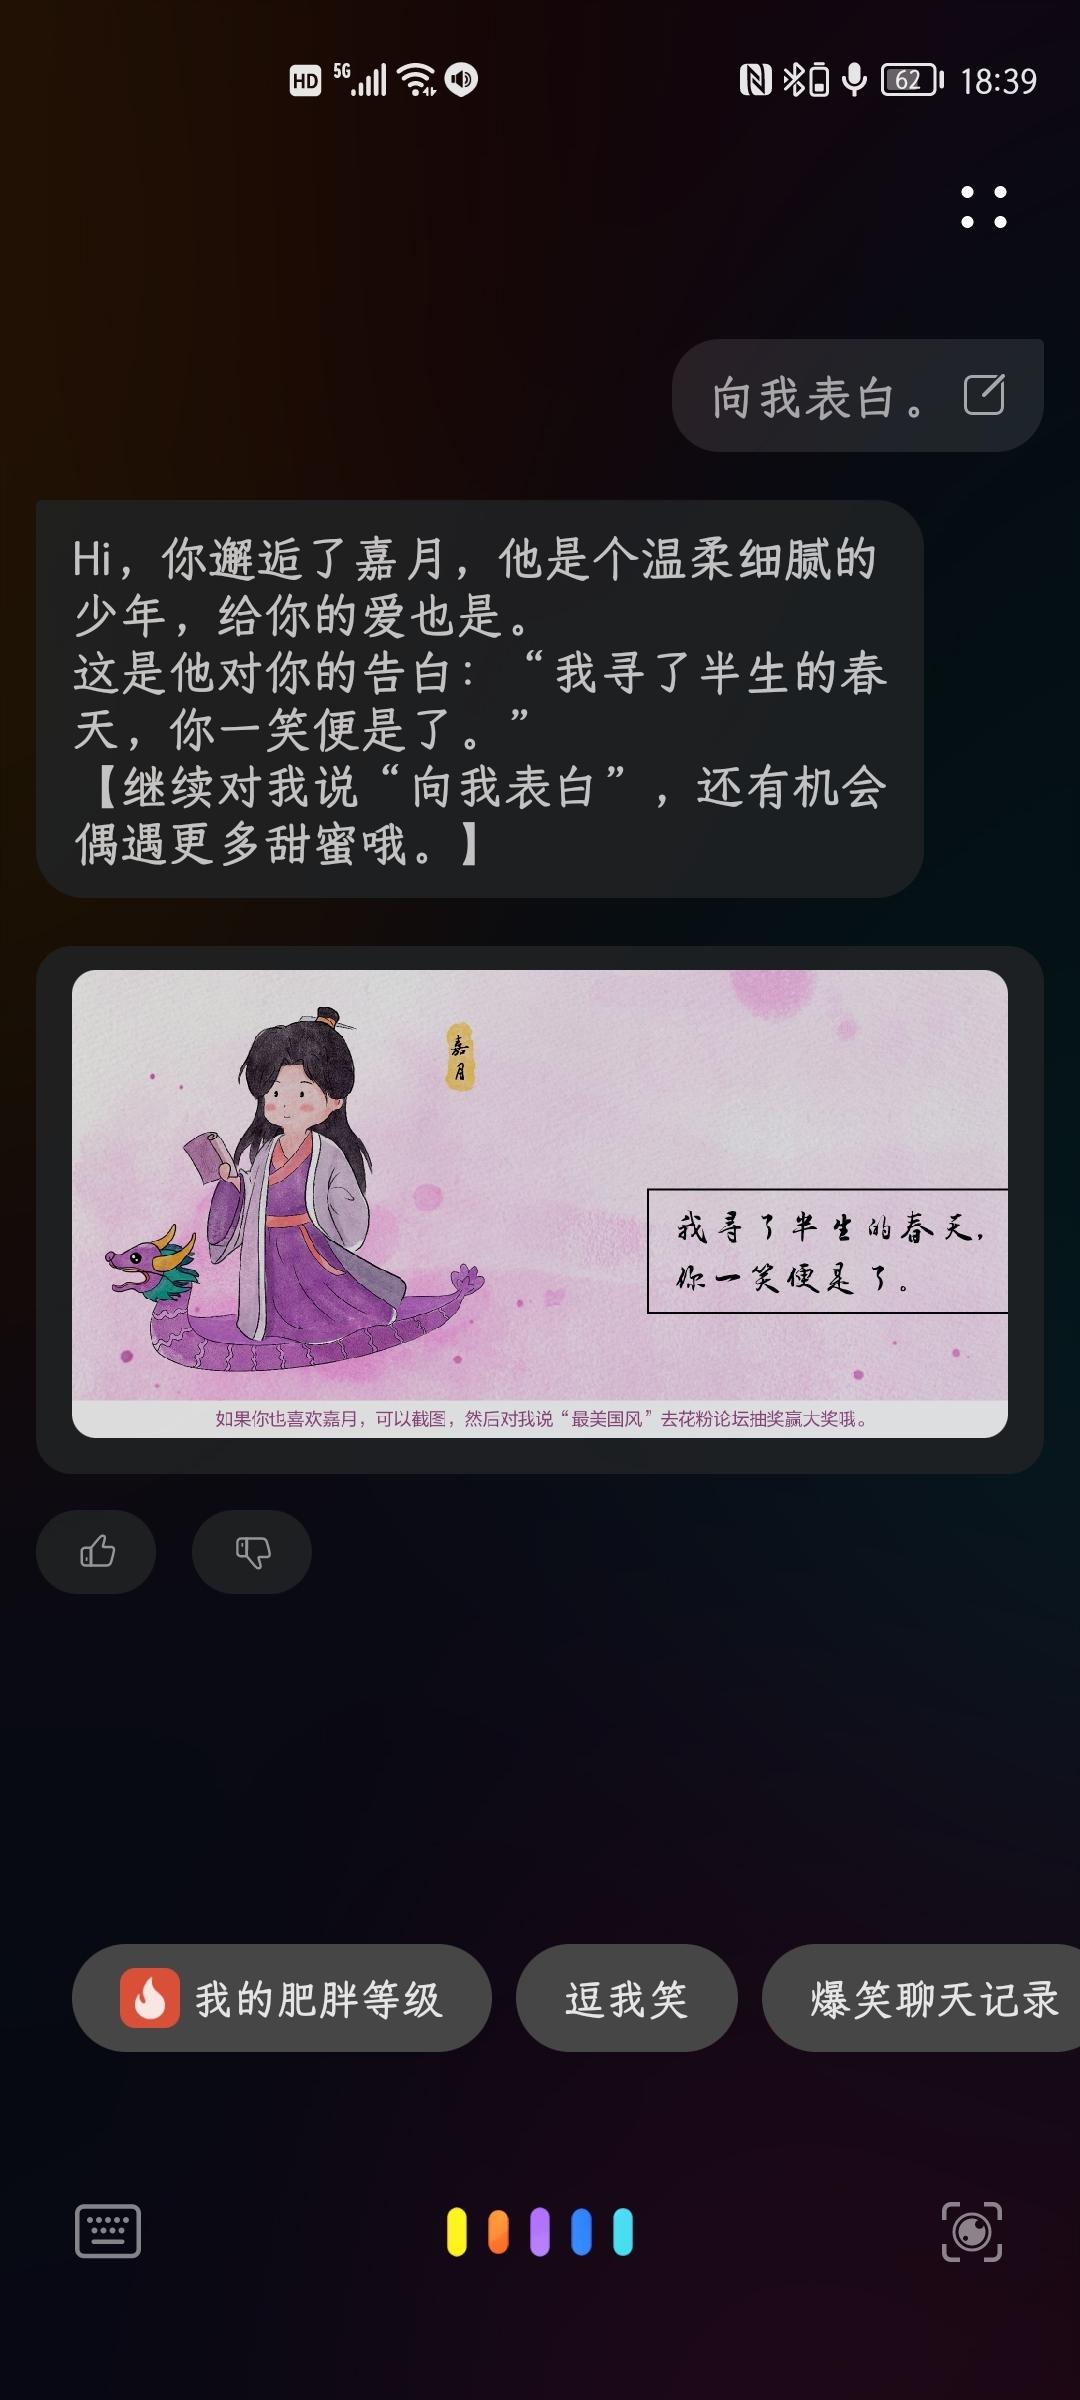 Screenshot_20210611_183911_com.huawei.vassistant.jpg